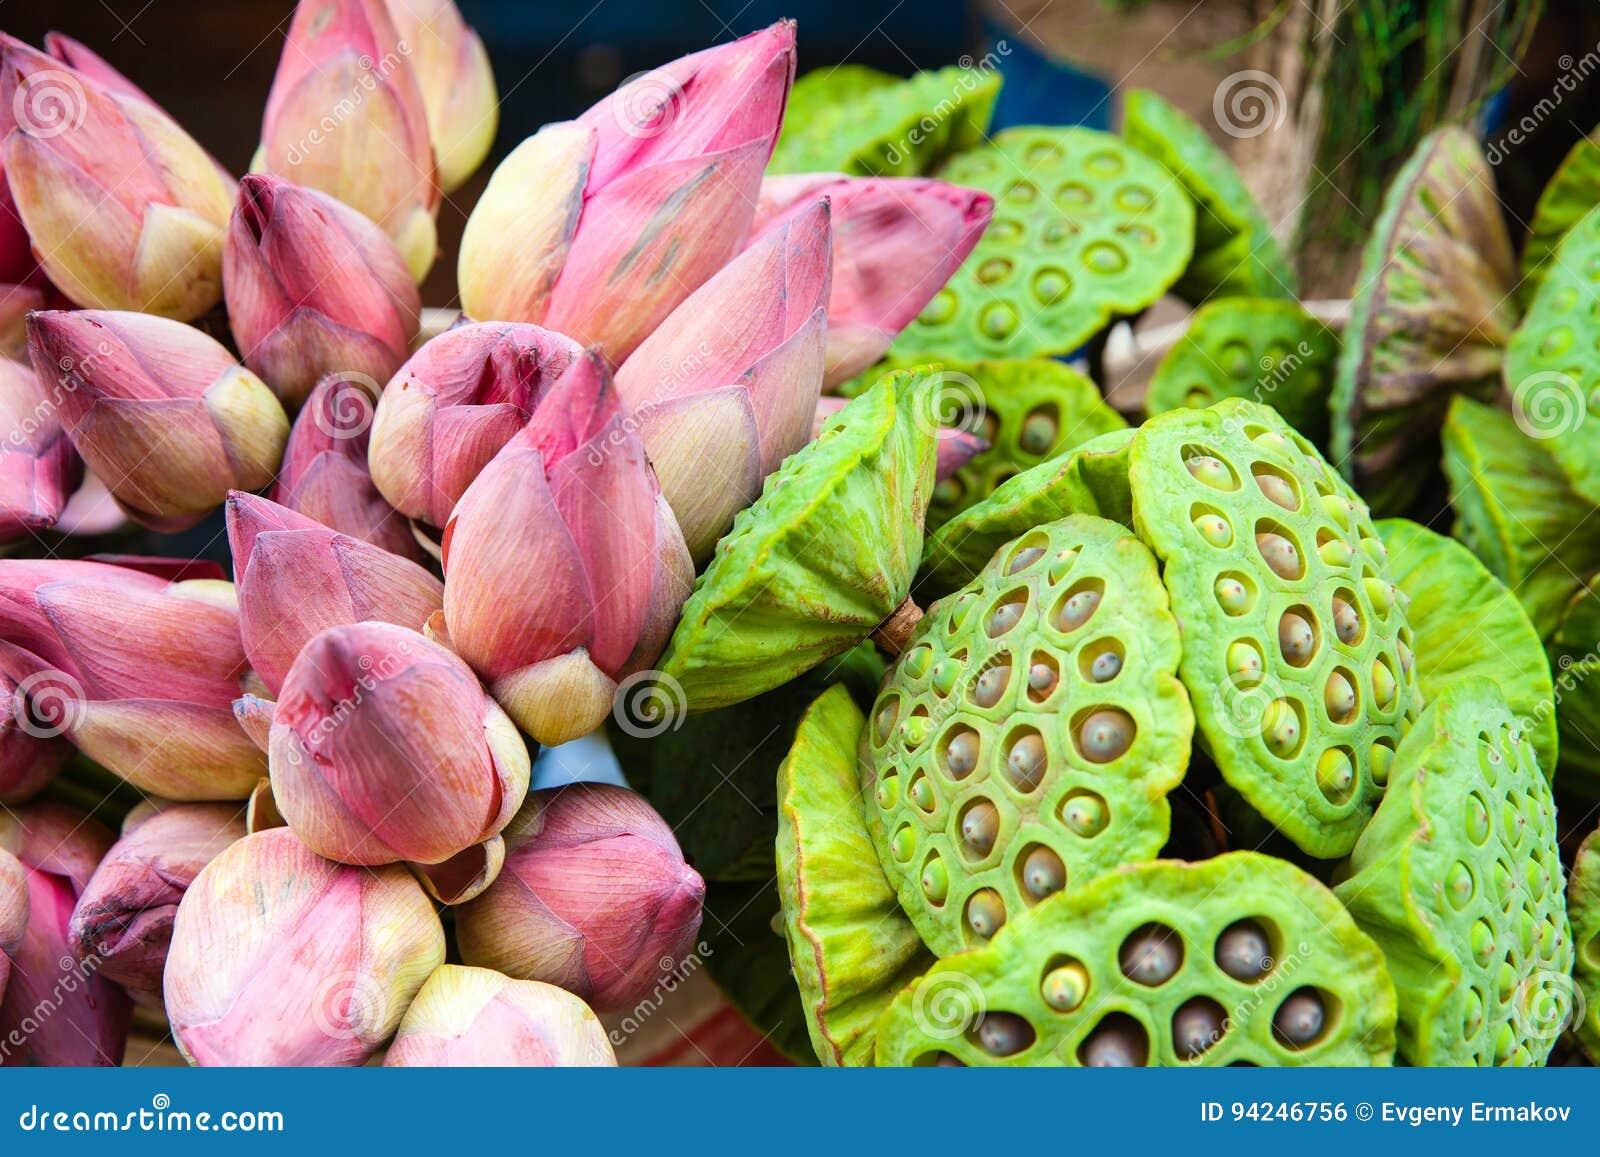 Bunch Of Lotus Flowers Stock Photo Image Of Beautiful 94246756